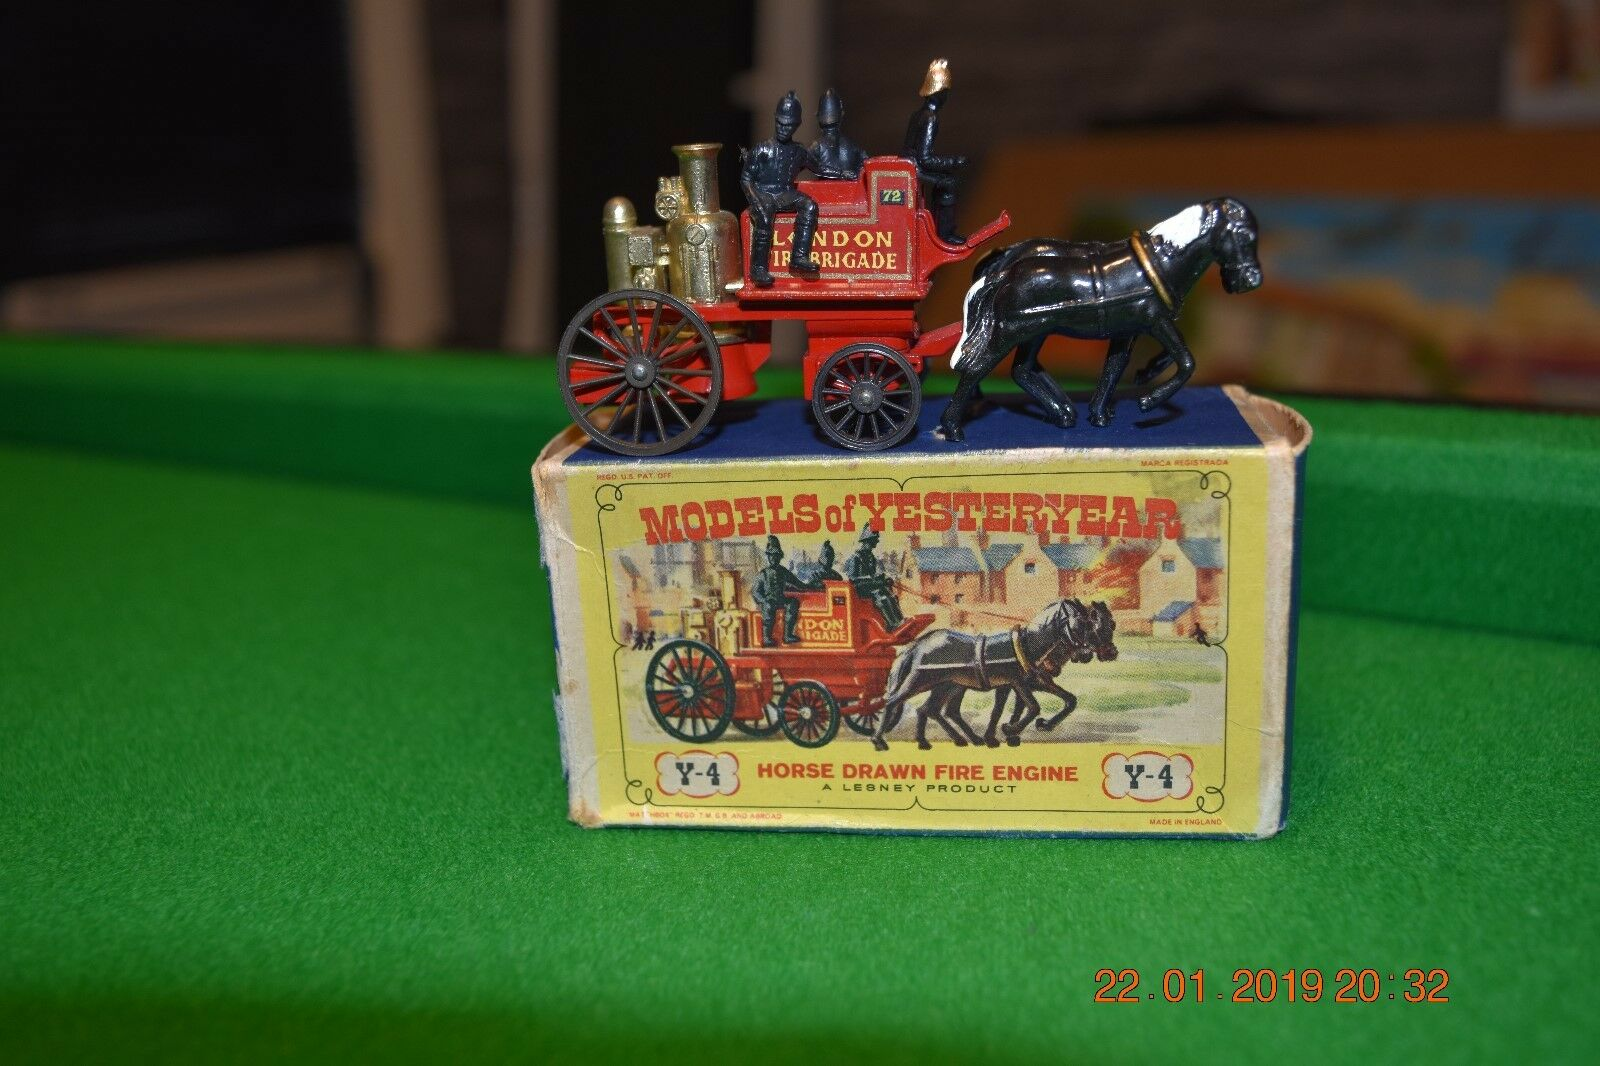 MATCHBOX Y4-2 SHAND MASON HORSE DRAWN FIRE ENGINE MODEL OF YESTERYEAR.